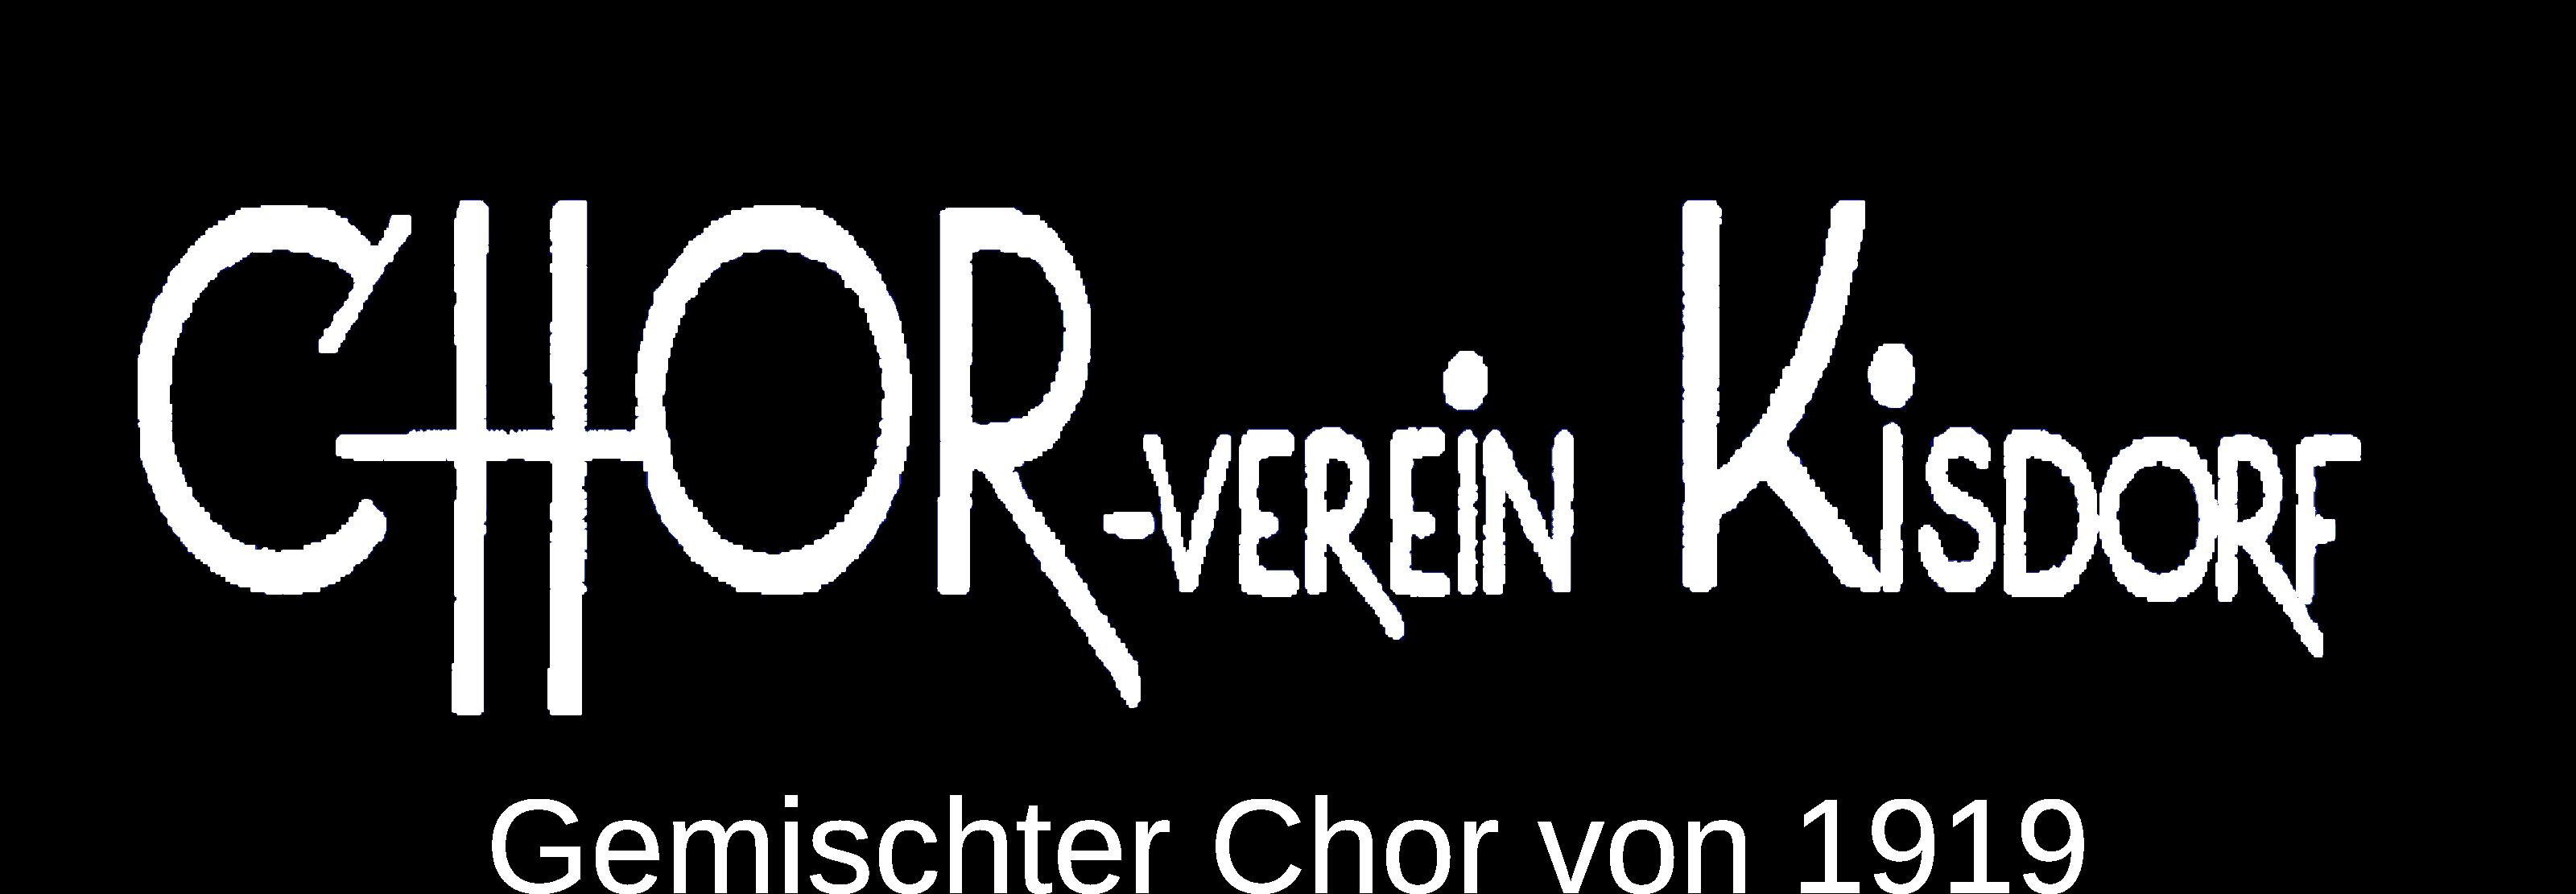 Chor-Verein Kisdorf